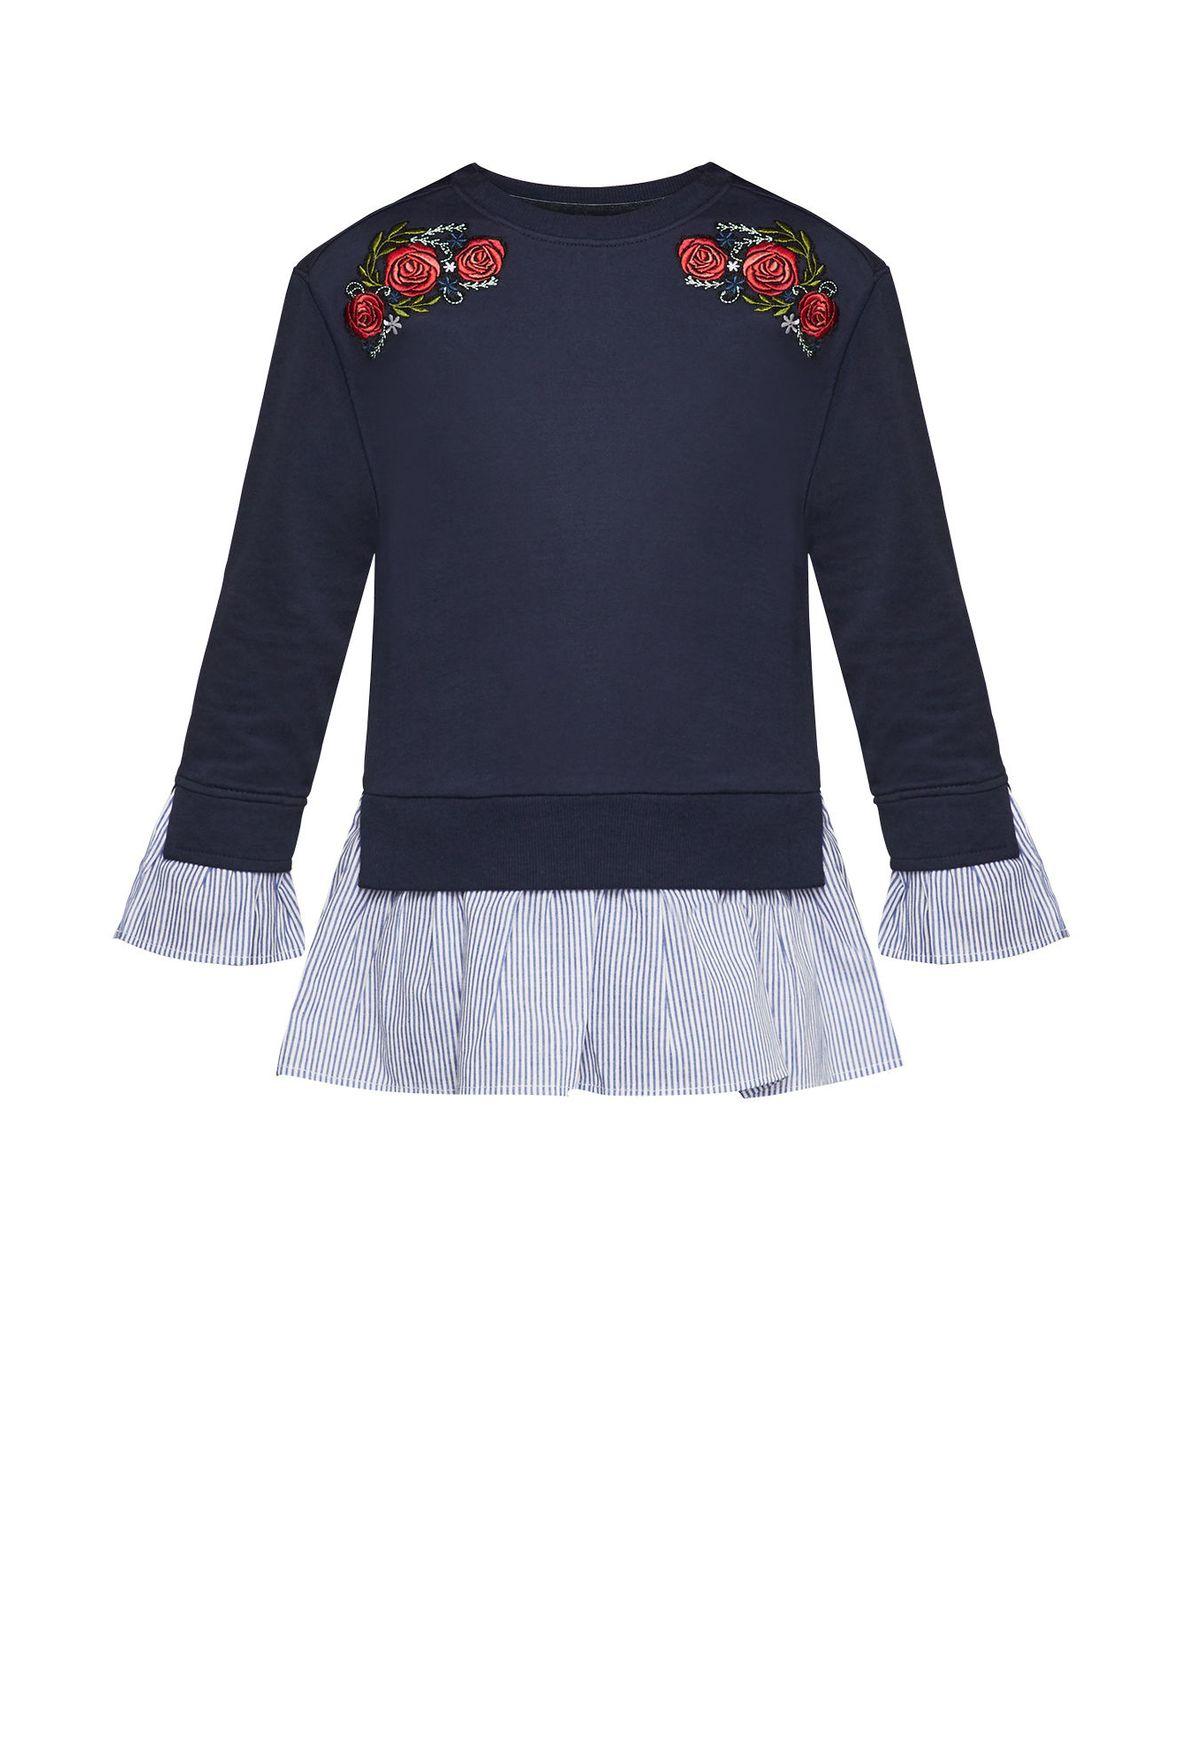 Blusa-girls-manga-larga-azul-marino-B638LK128_NVY_e